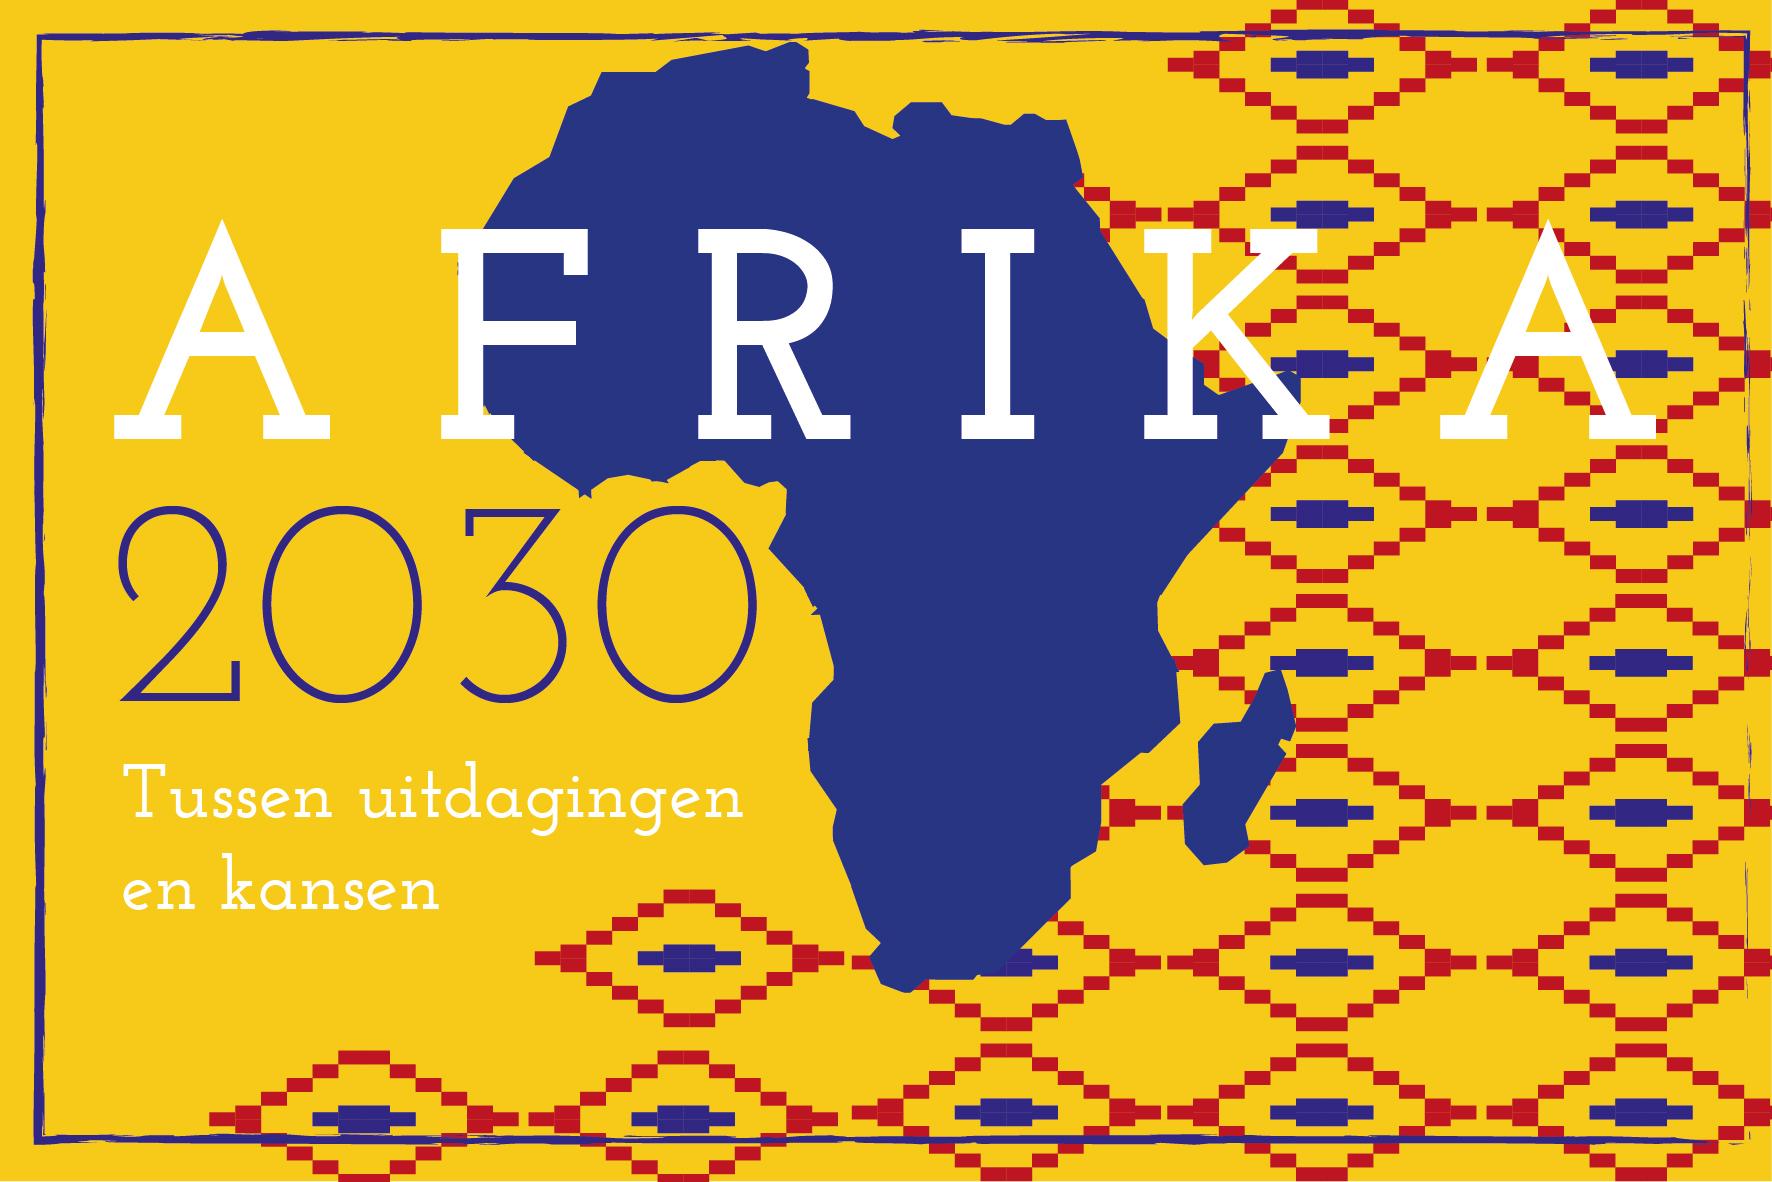 https://viceversaonline.nl/site/wp-content/uploads/2019/01/Afrika2030_2_Tekengebied-1.jpg